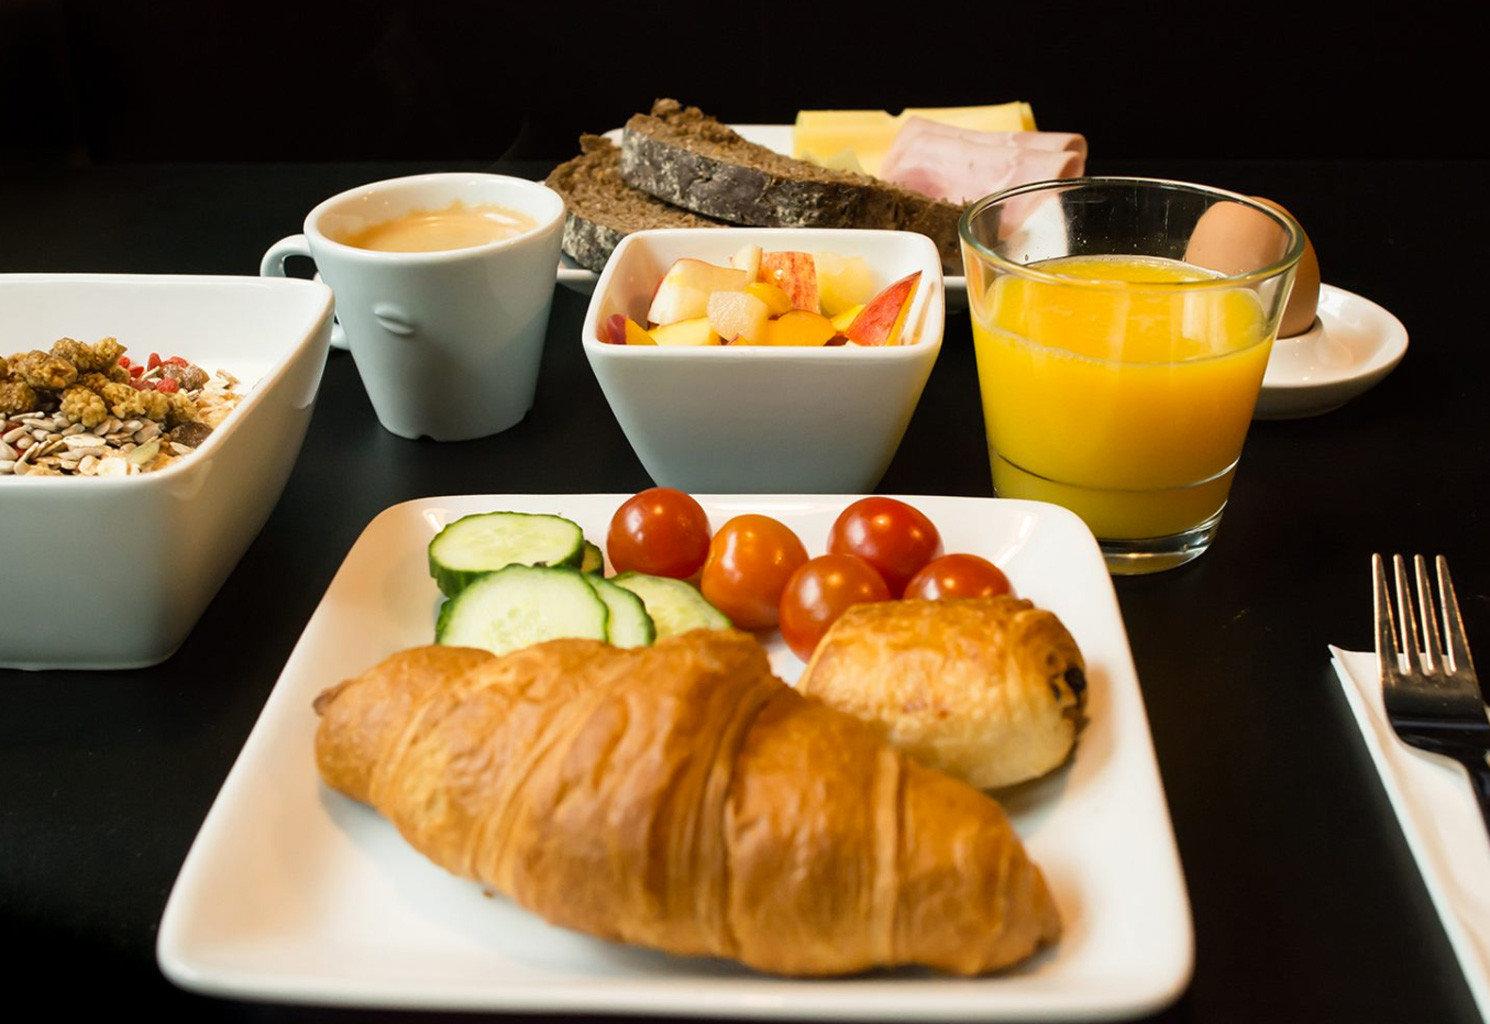 food plate cup breakfast brunch tray cuisine dessert lunch